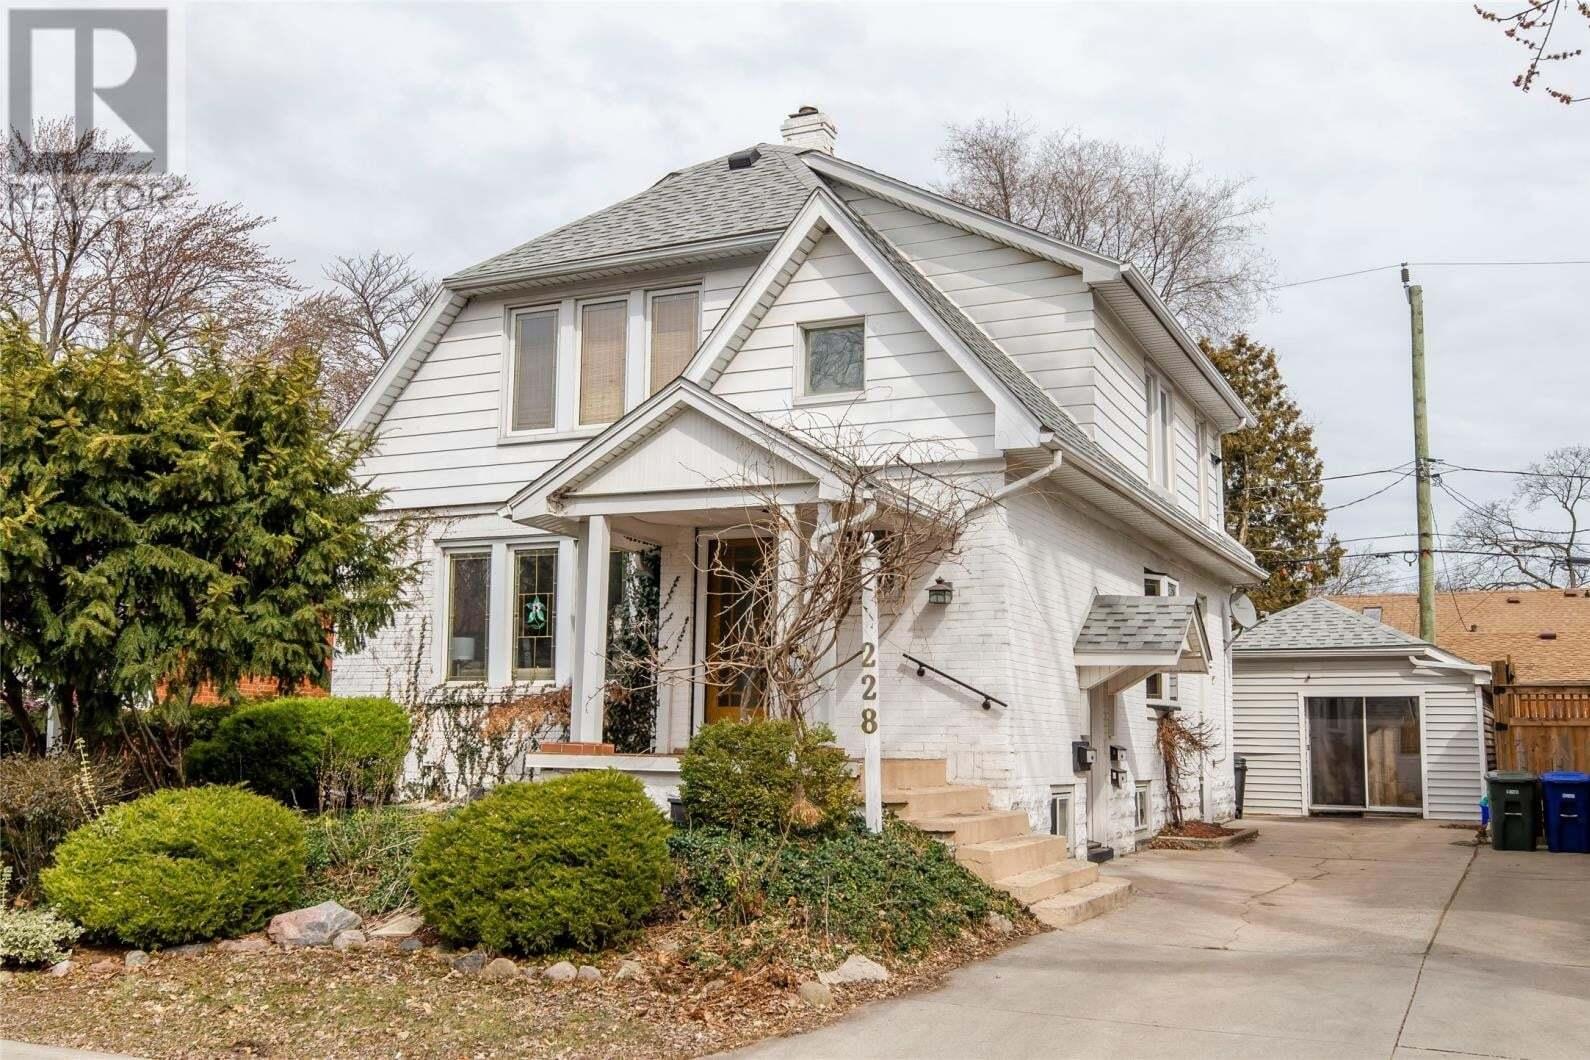 Townhouse for sale at 228 Prado  Windsor Ontario - MLS: 20006304